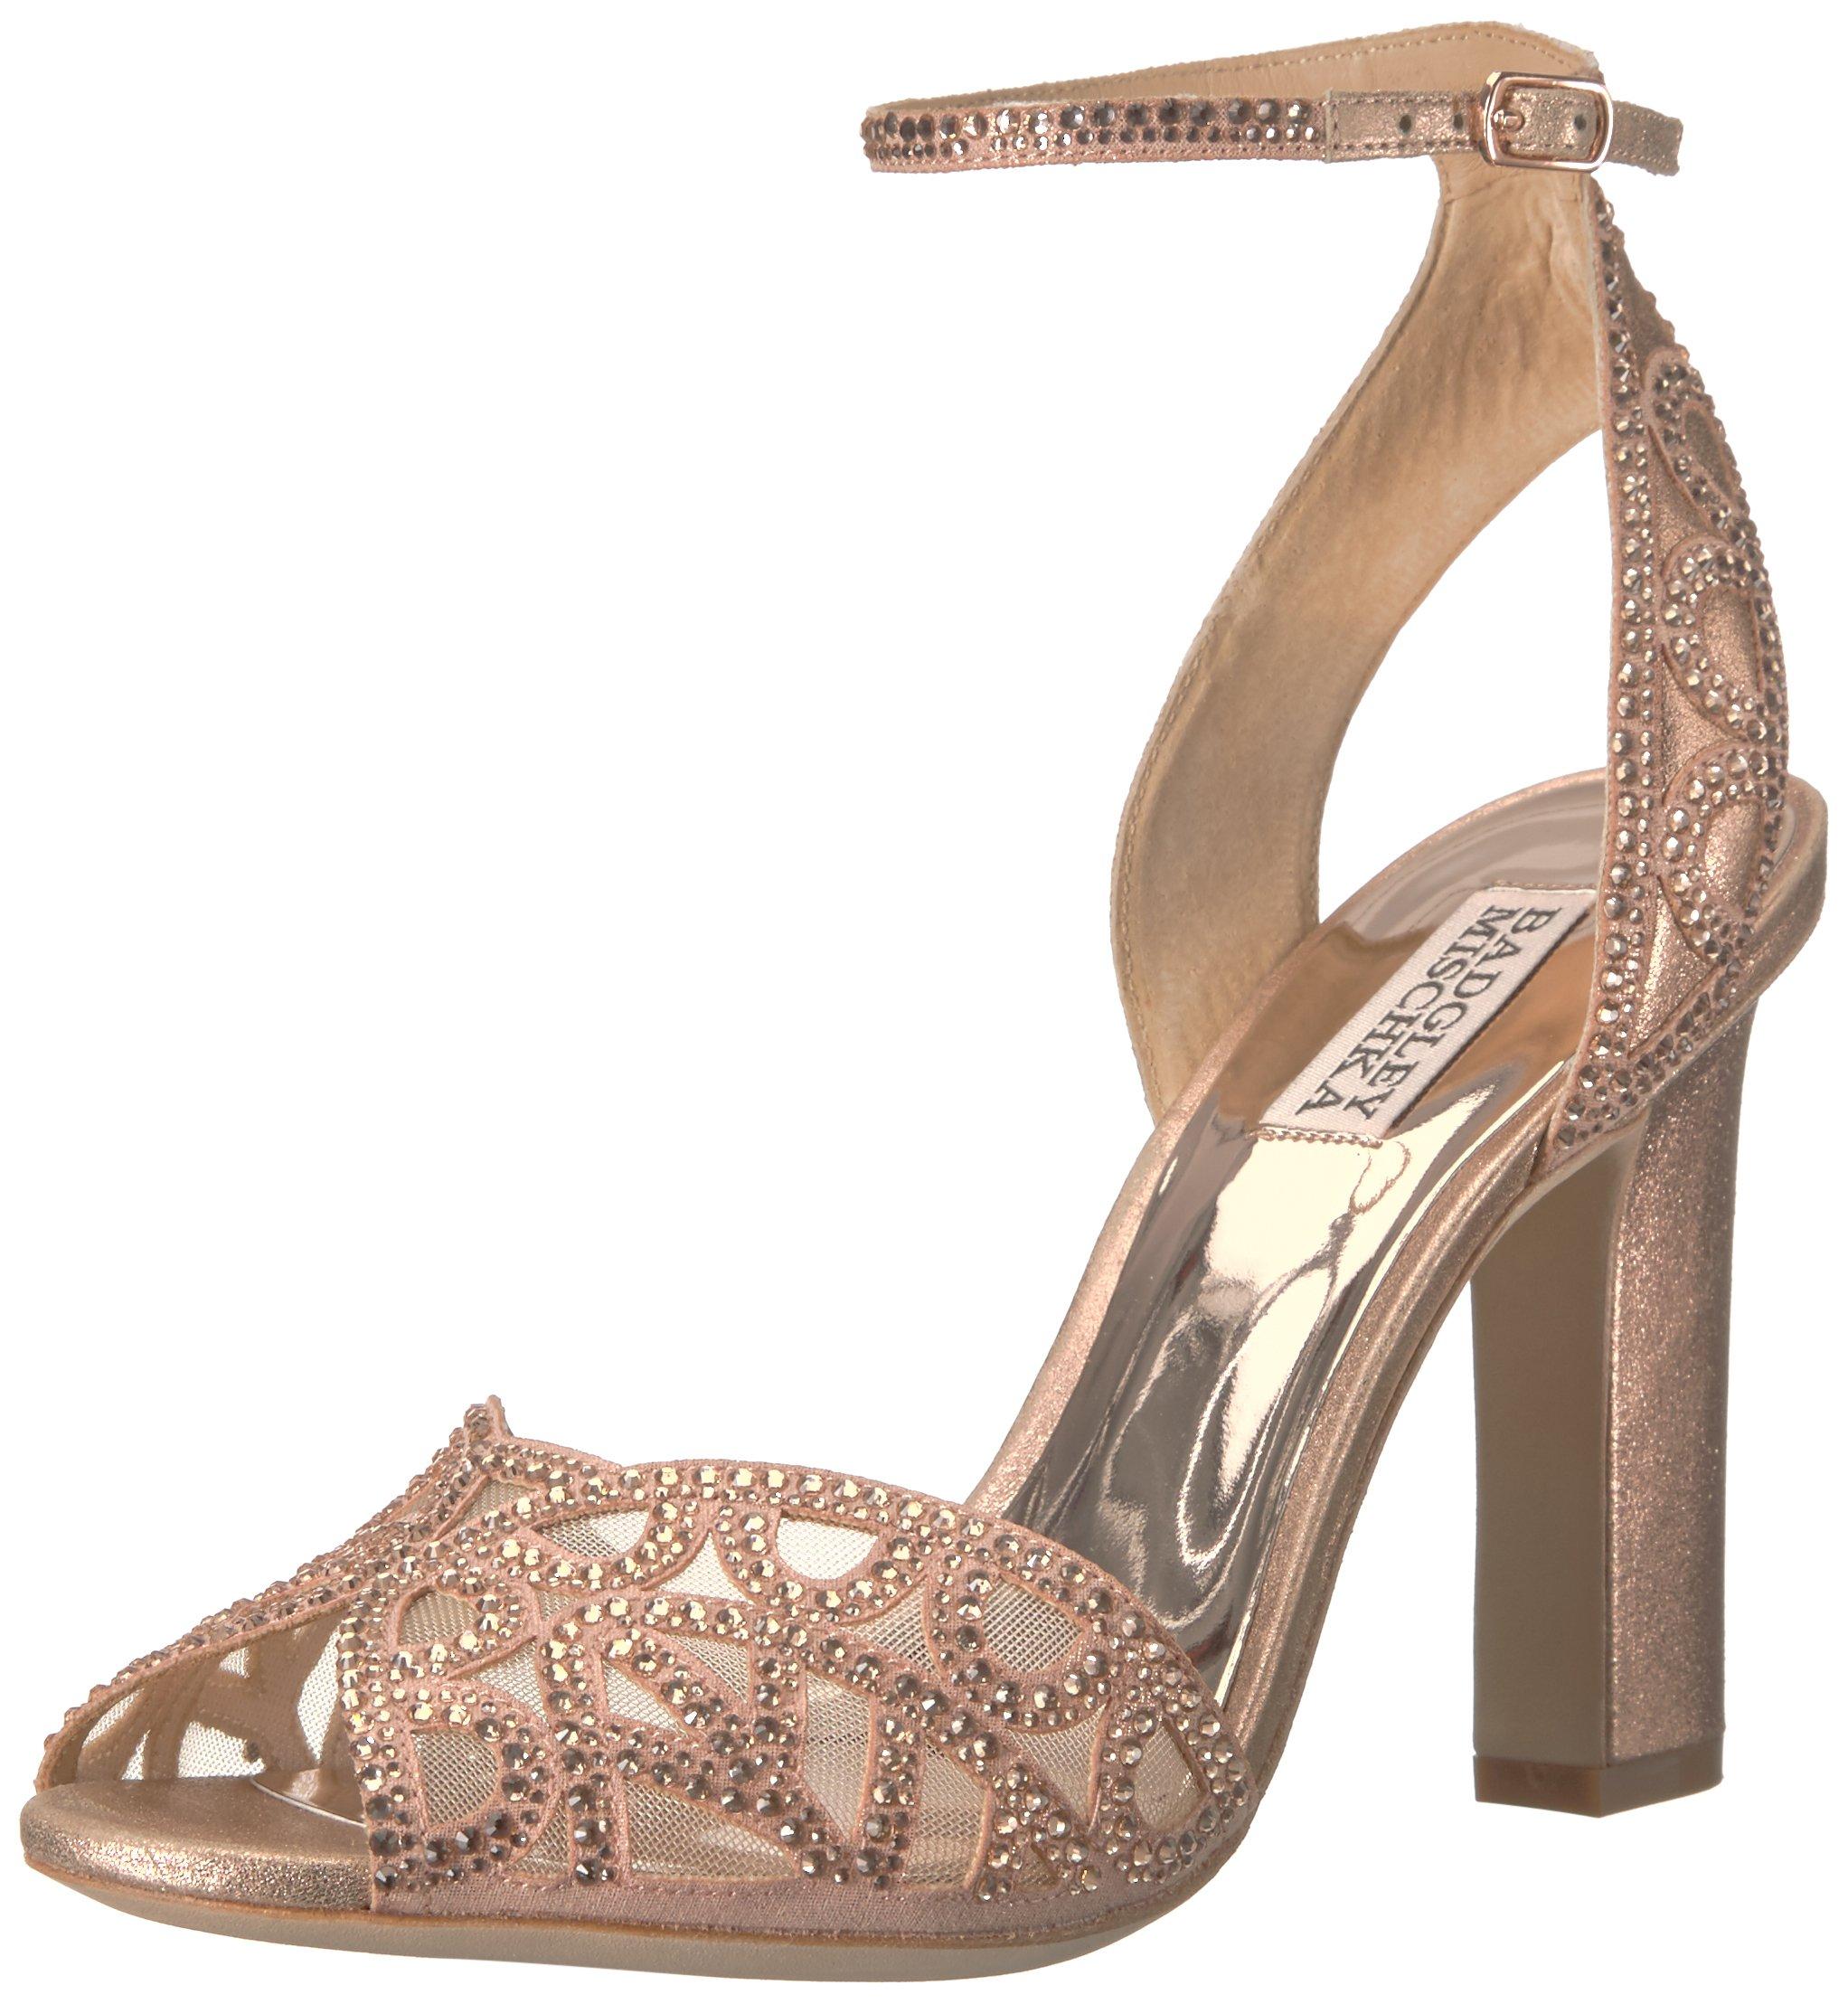 Badgley Mischka Women's Hart Heeled Sandal, Rose Gold, 7.5 M US